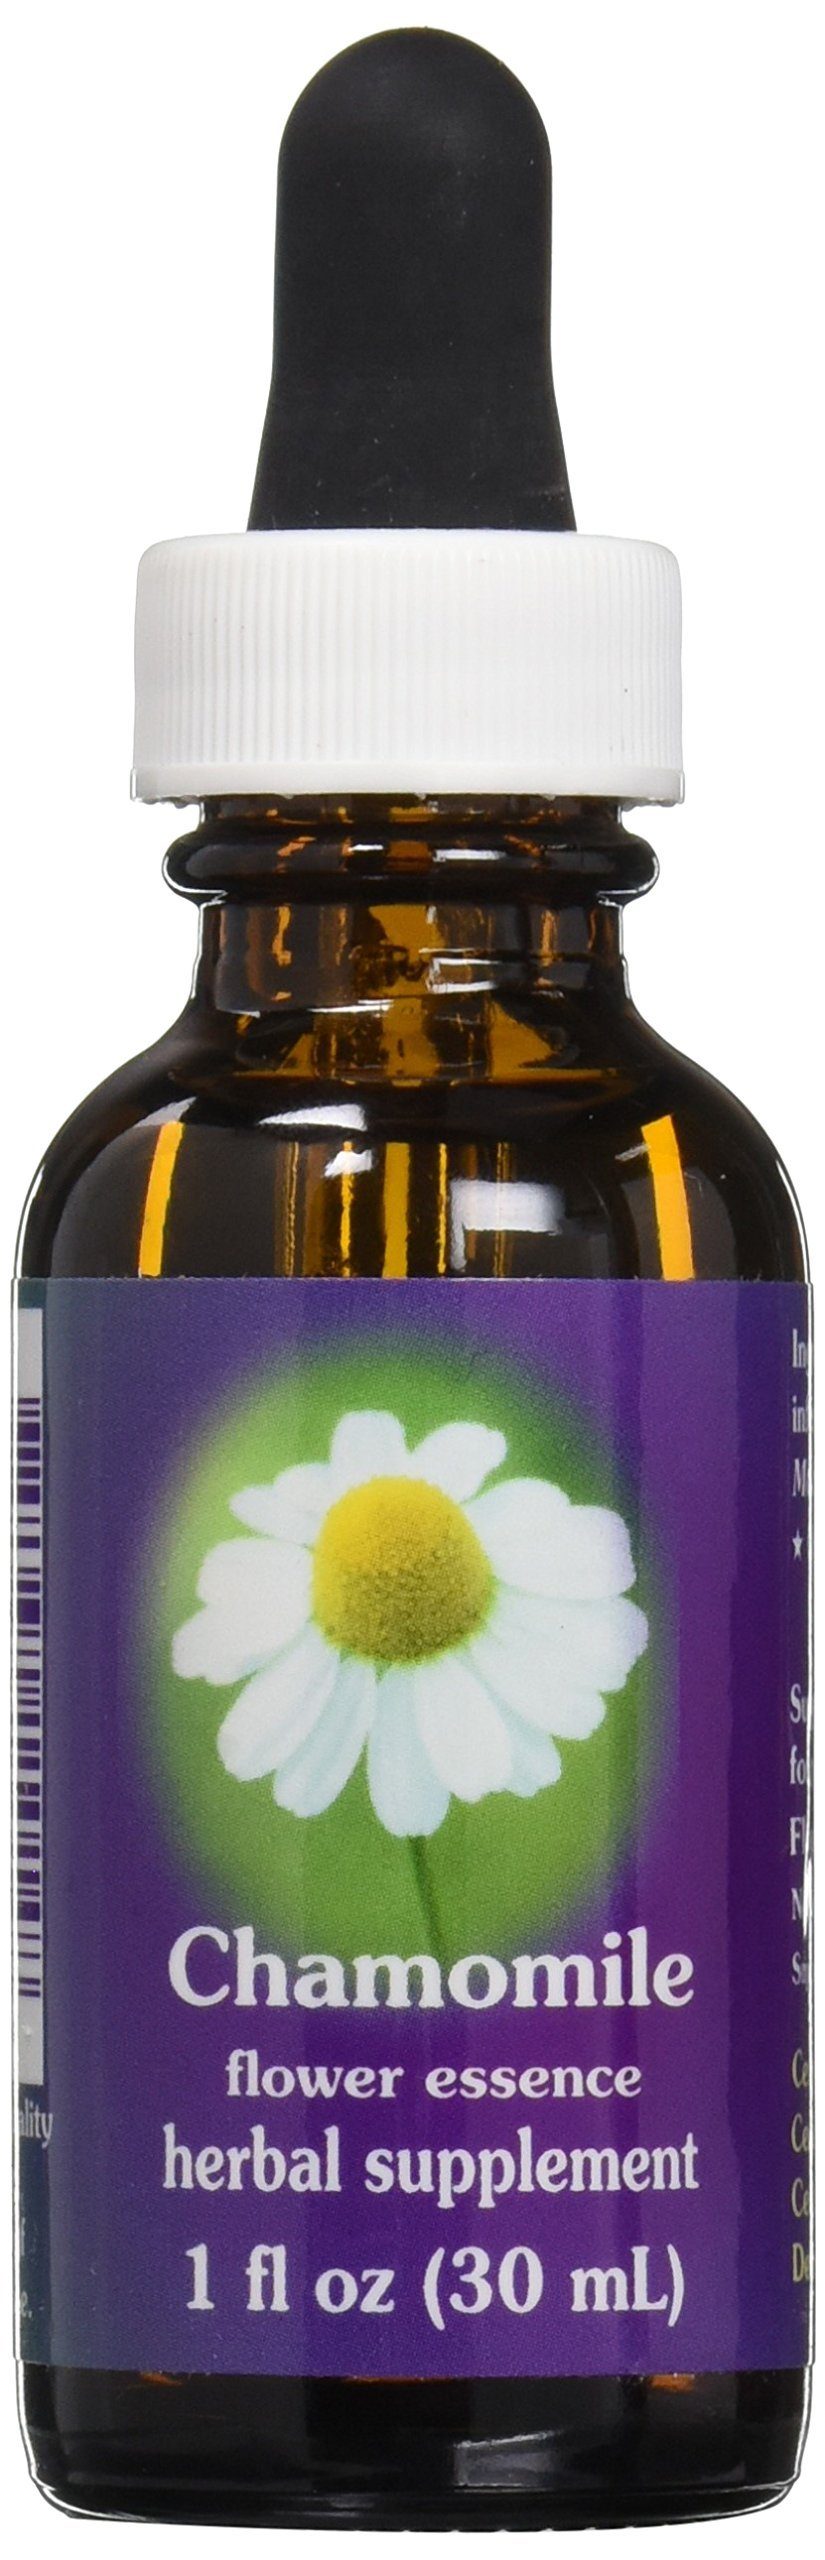 Amazon Flower Essence Services Yarrow Dropper Herbal